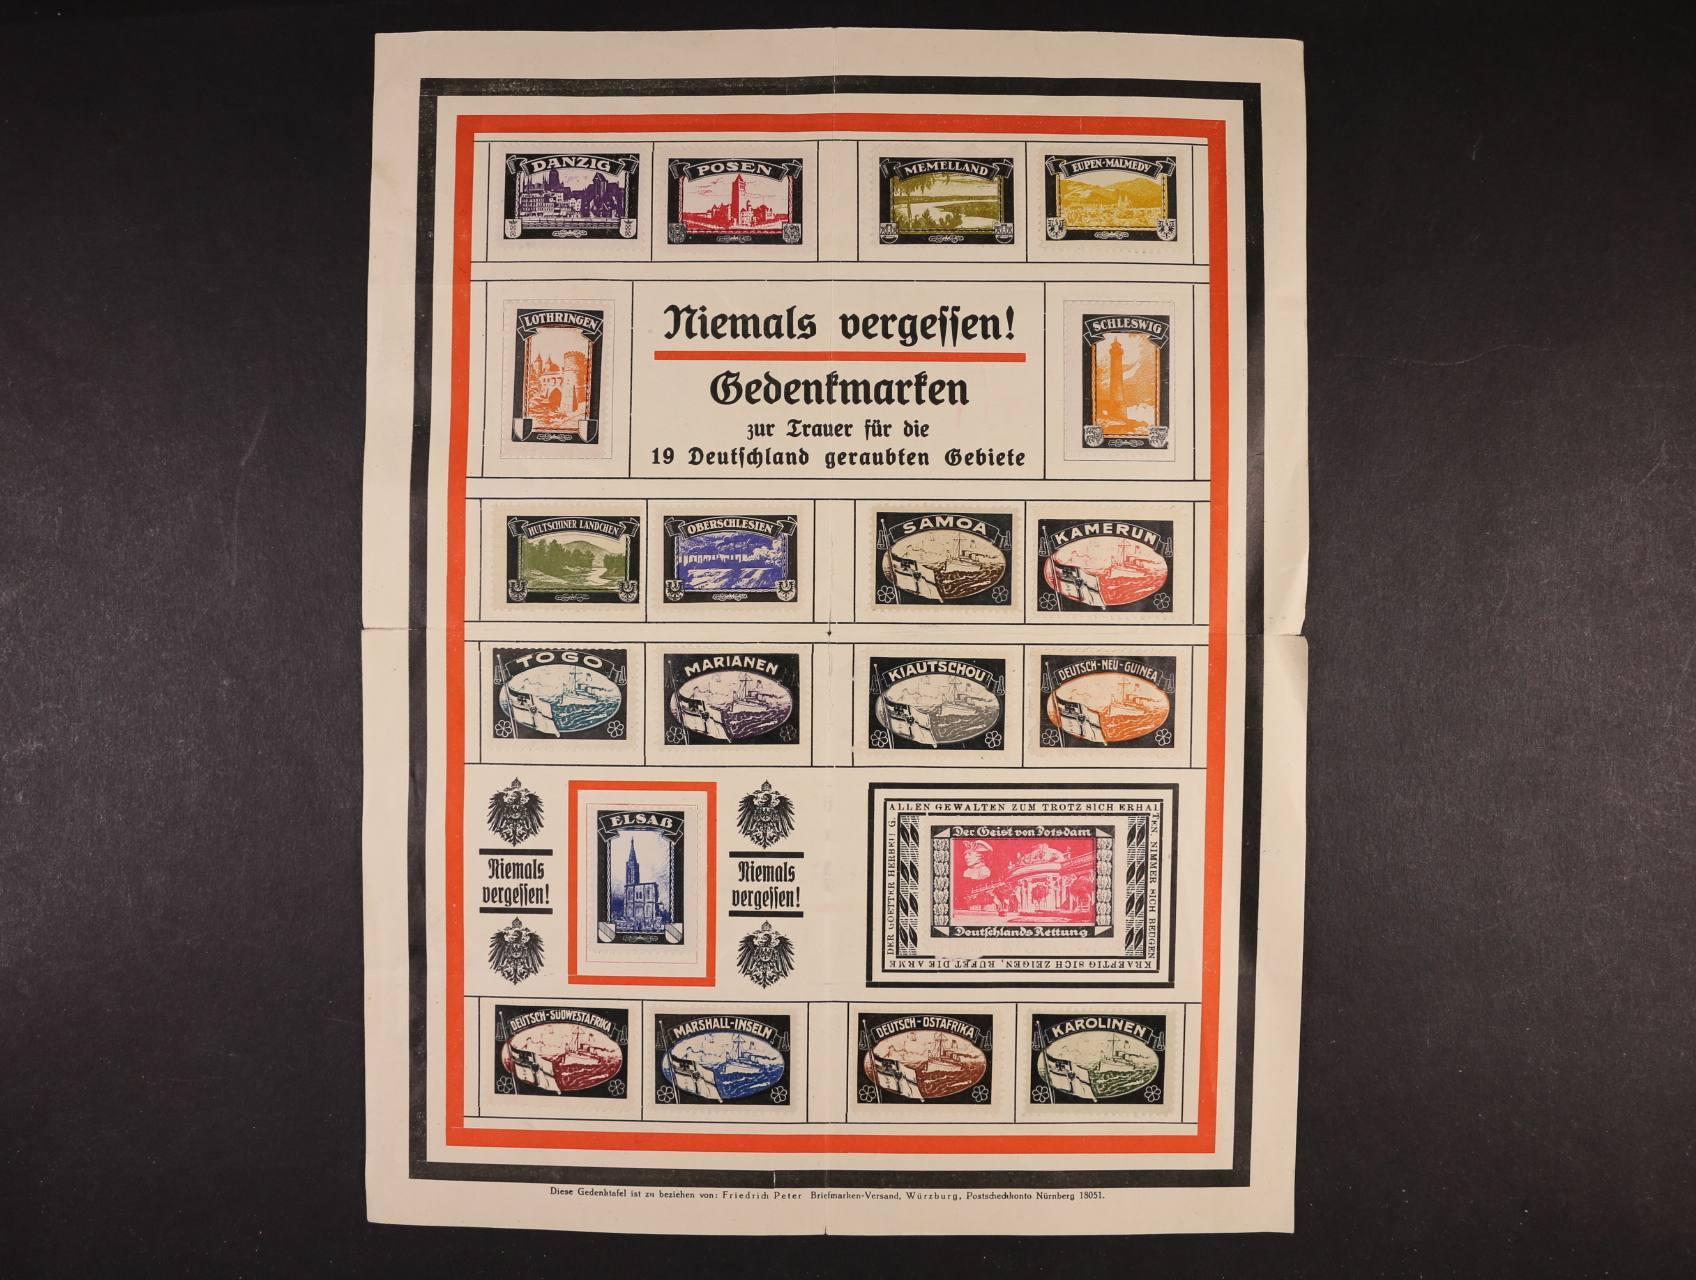 nabídkový list s 20ti ks propag. nálepkami obsazených území Danzig, Posen, Deutsch - Ostafrika, Karoůinen